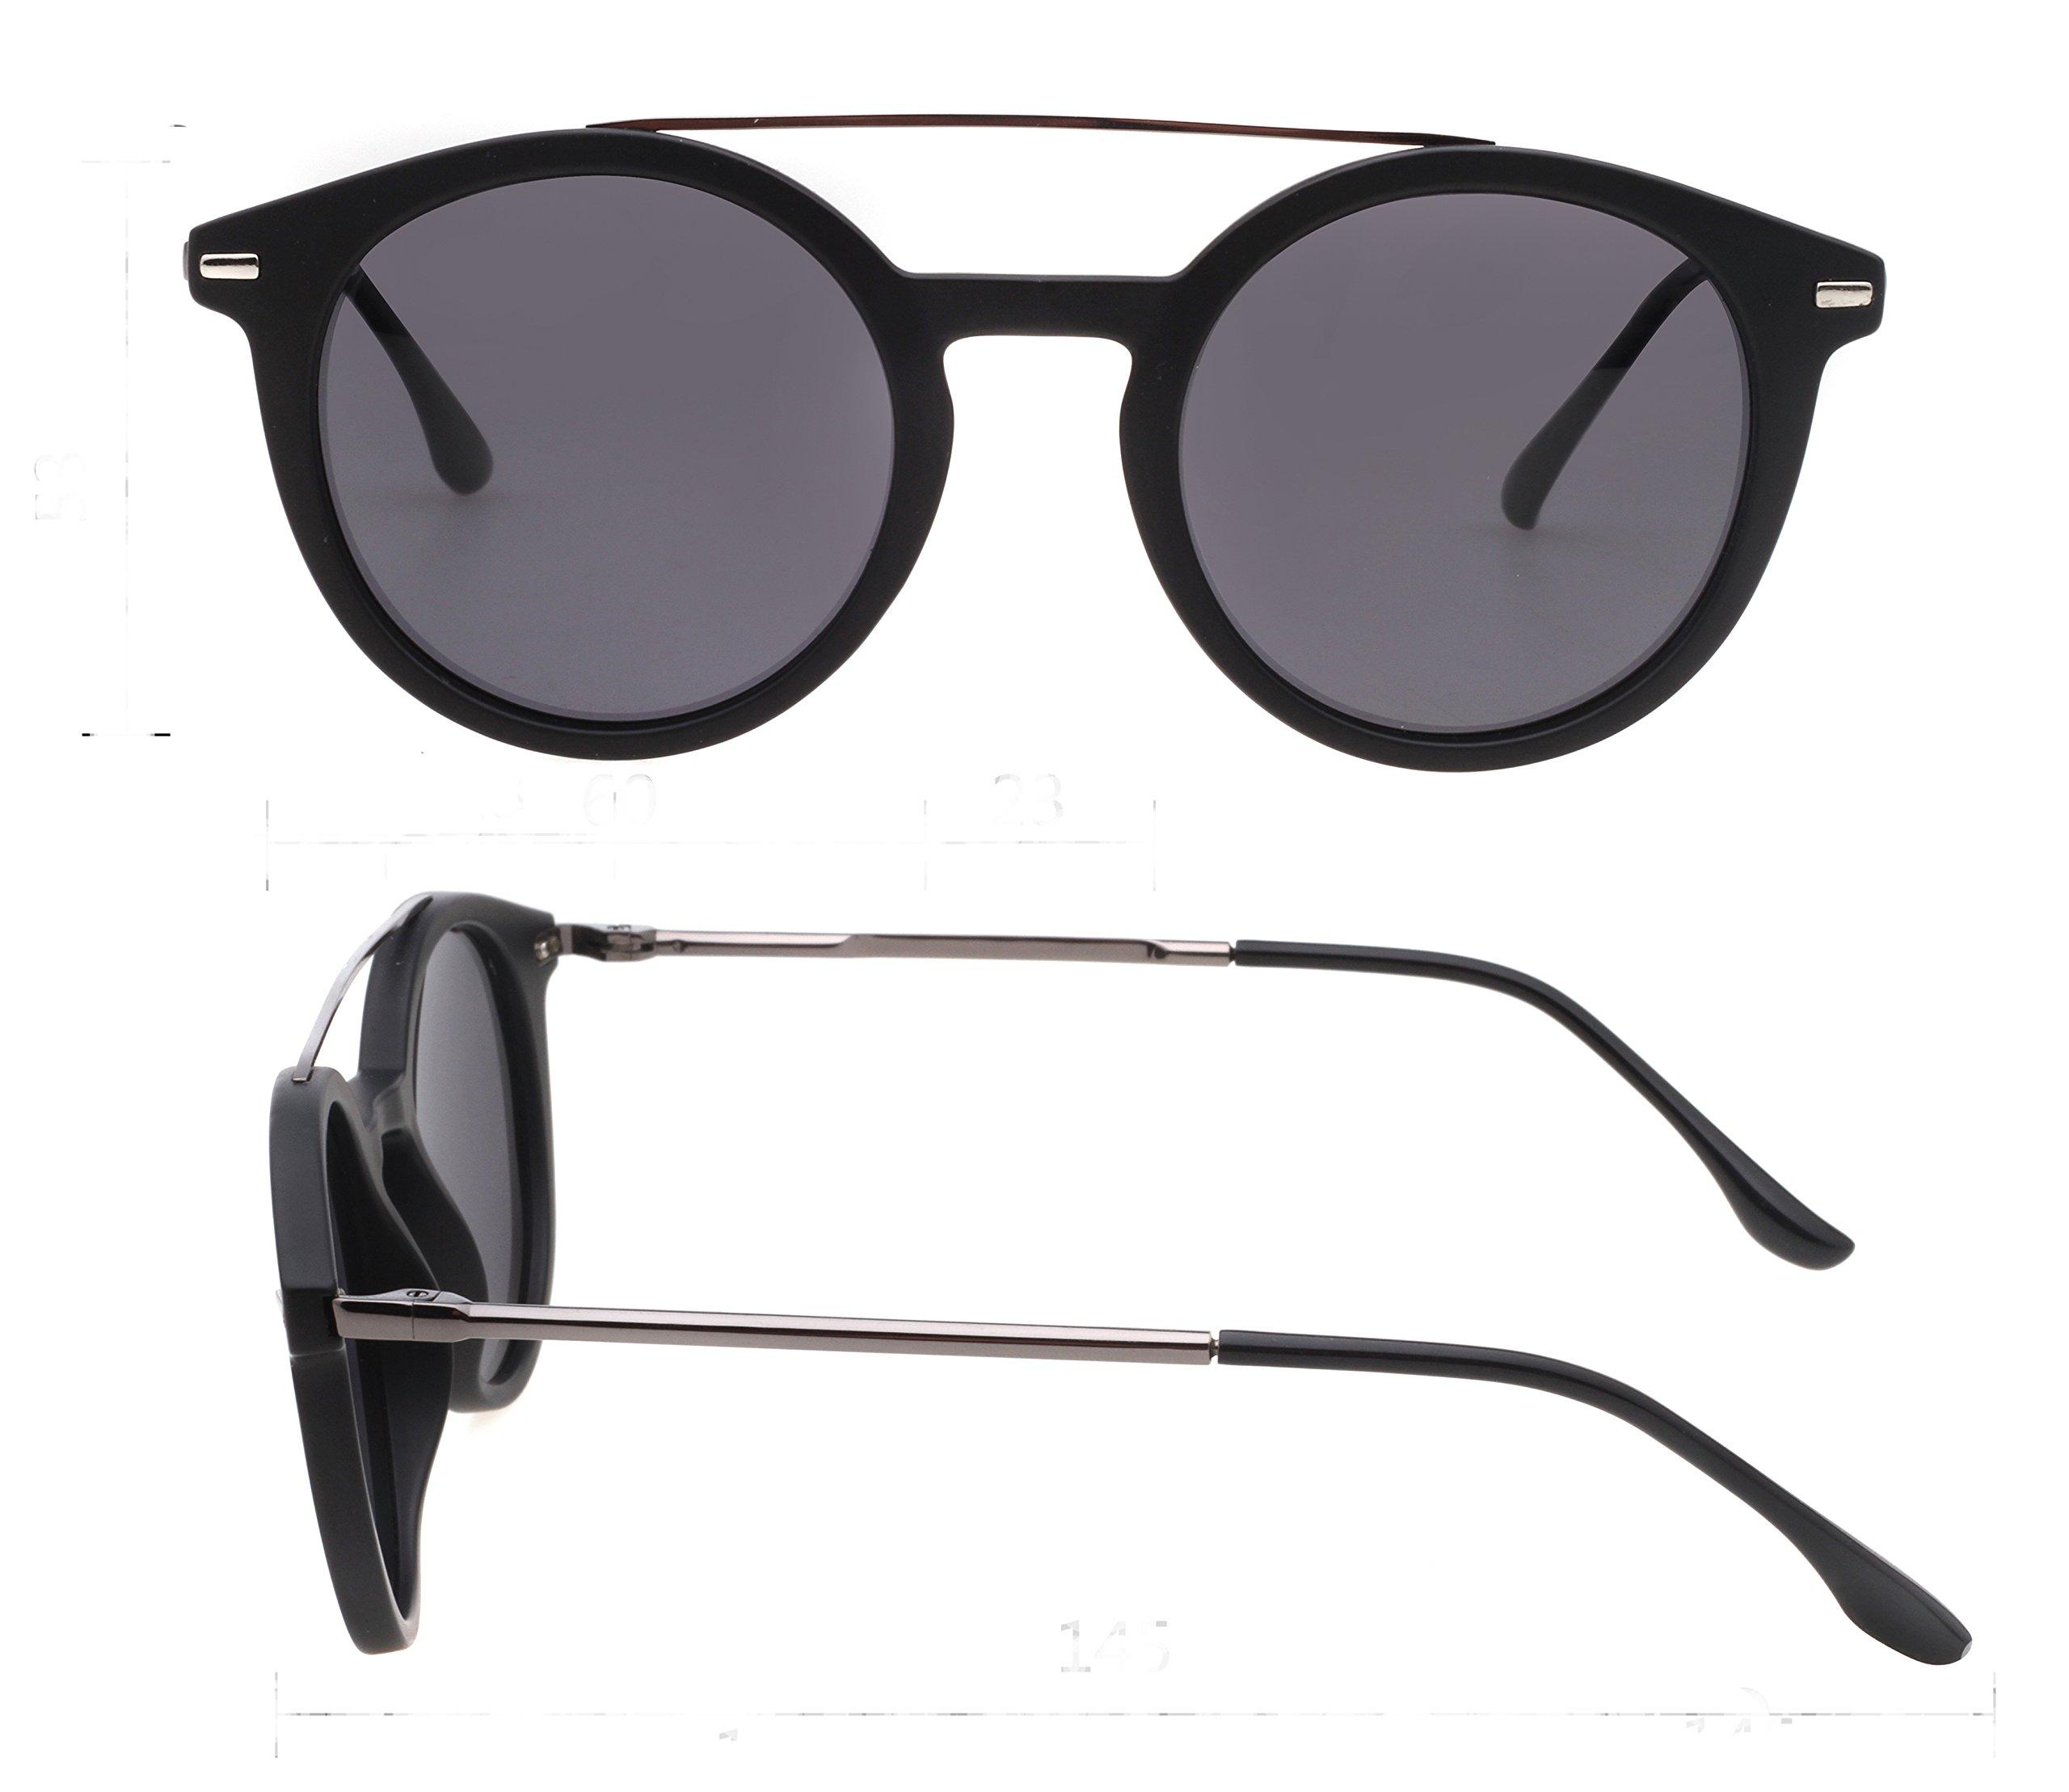 9a0d97a2ed Retro Round Polarized Sunglasses for Women Men New Style Fashion Metal  Frame pk1015